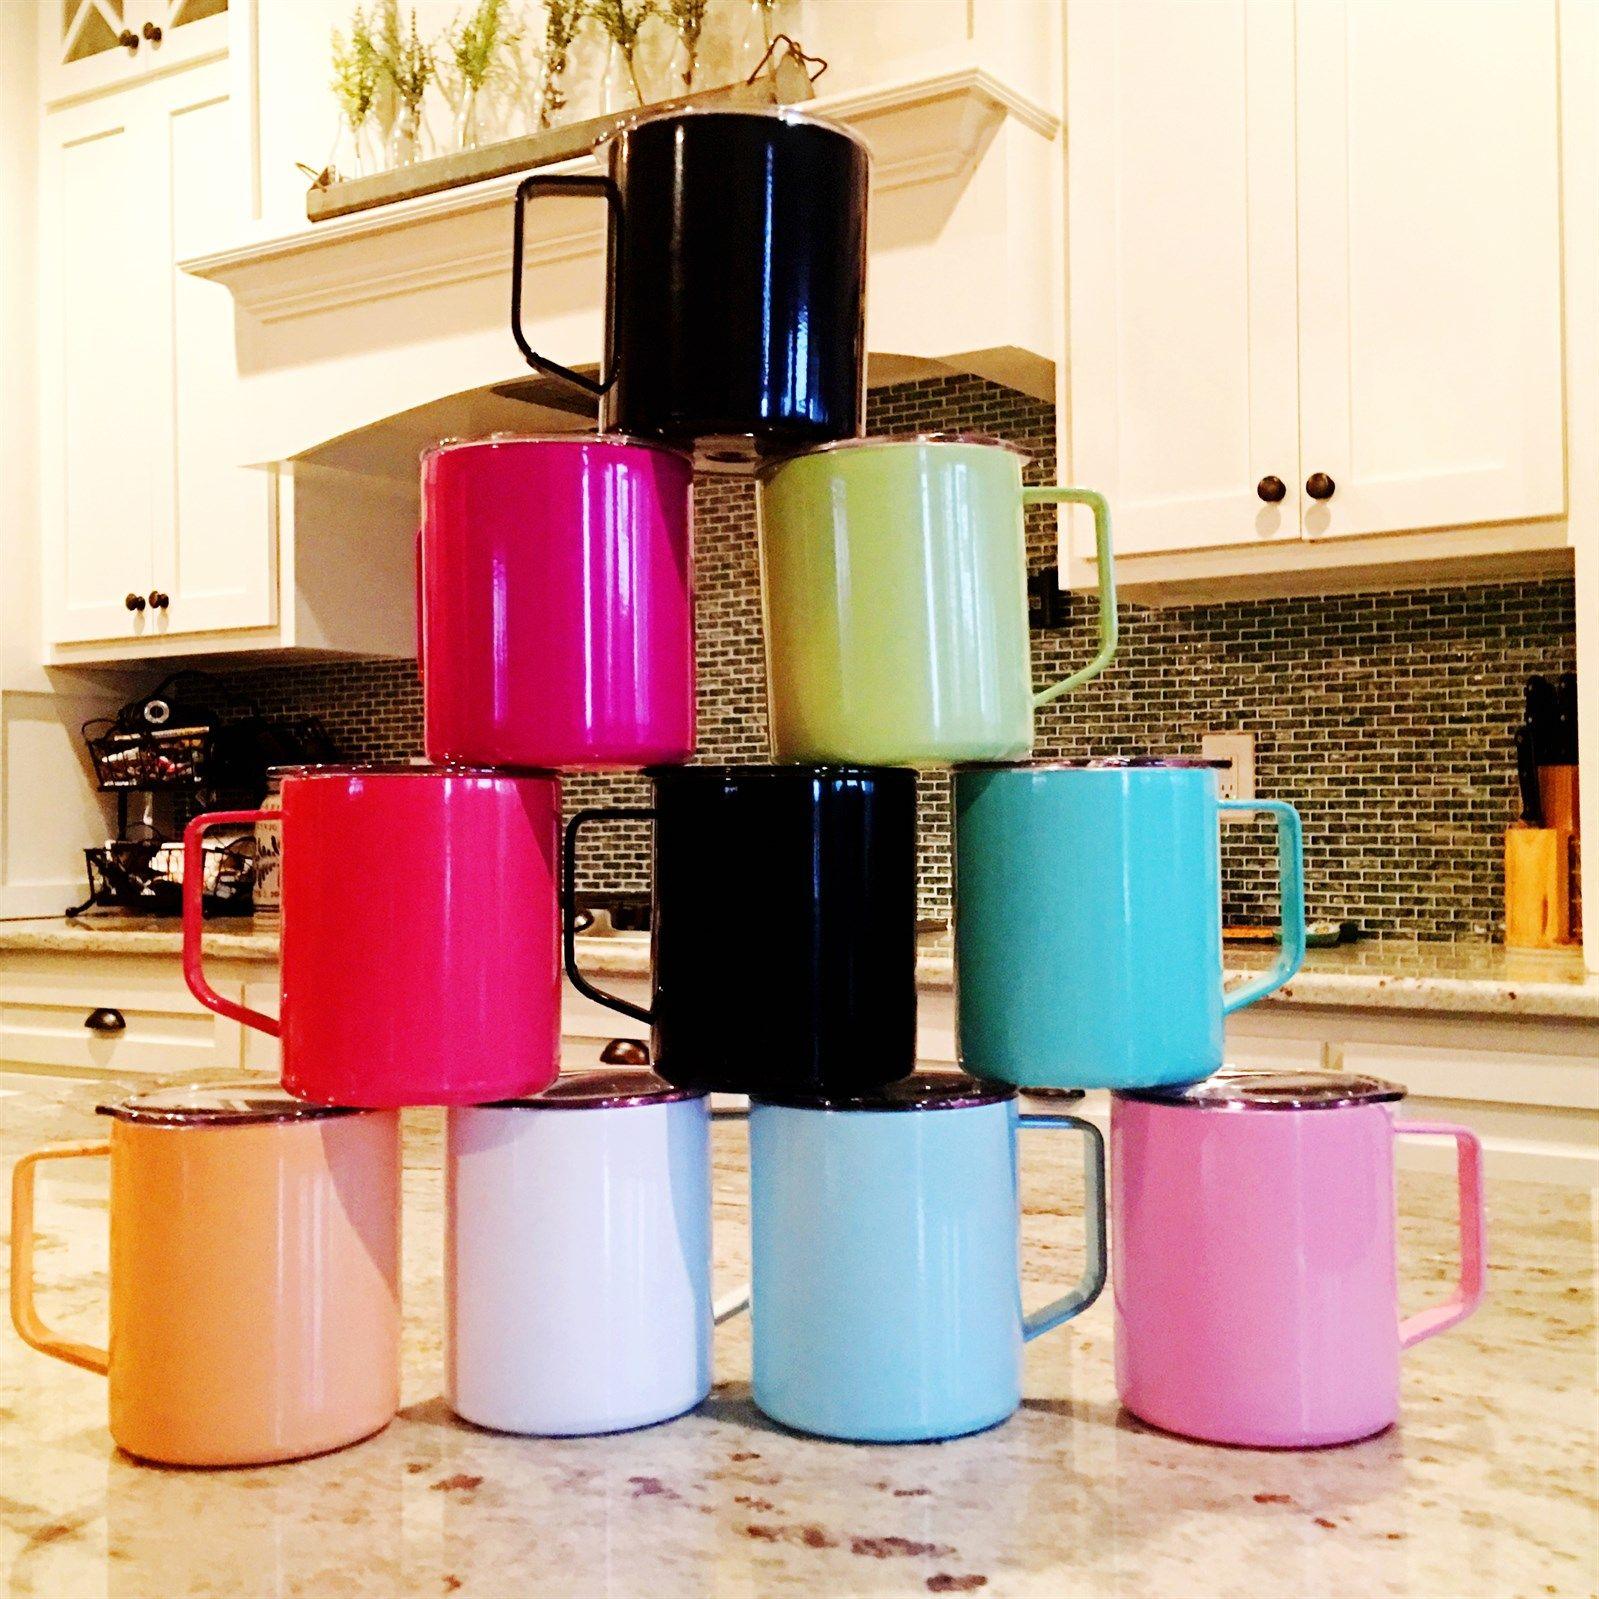 Stainless Coffee Cups Coffee cups, Coffee, Stainless